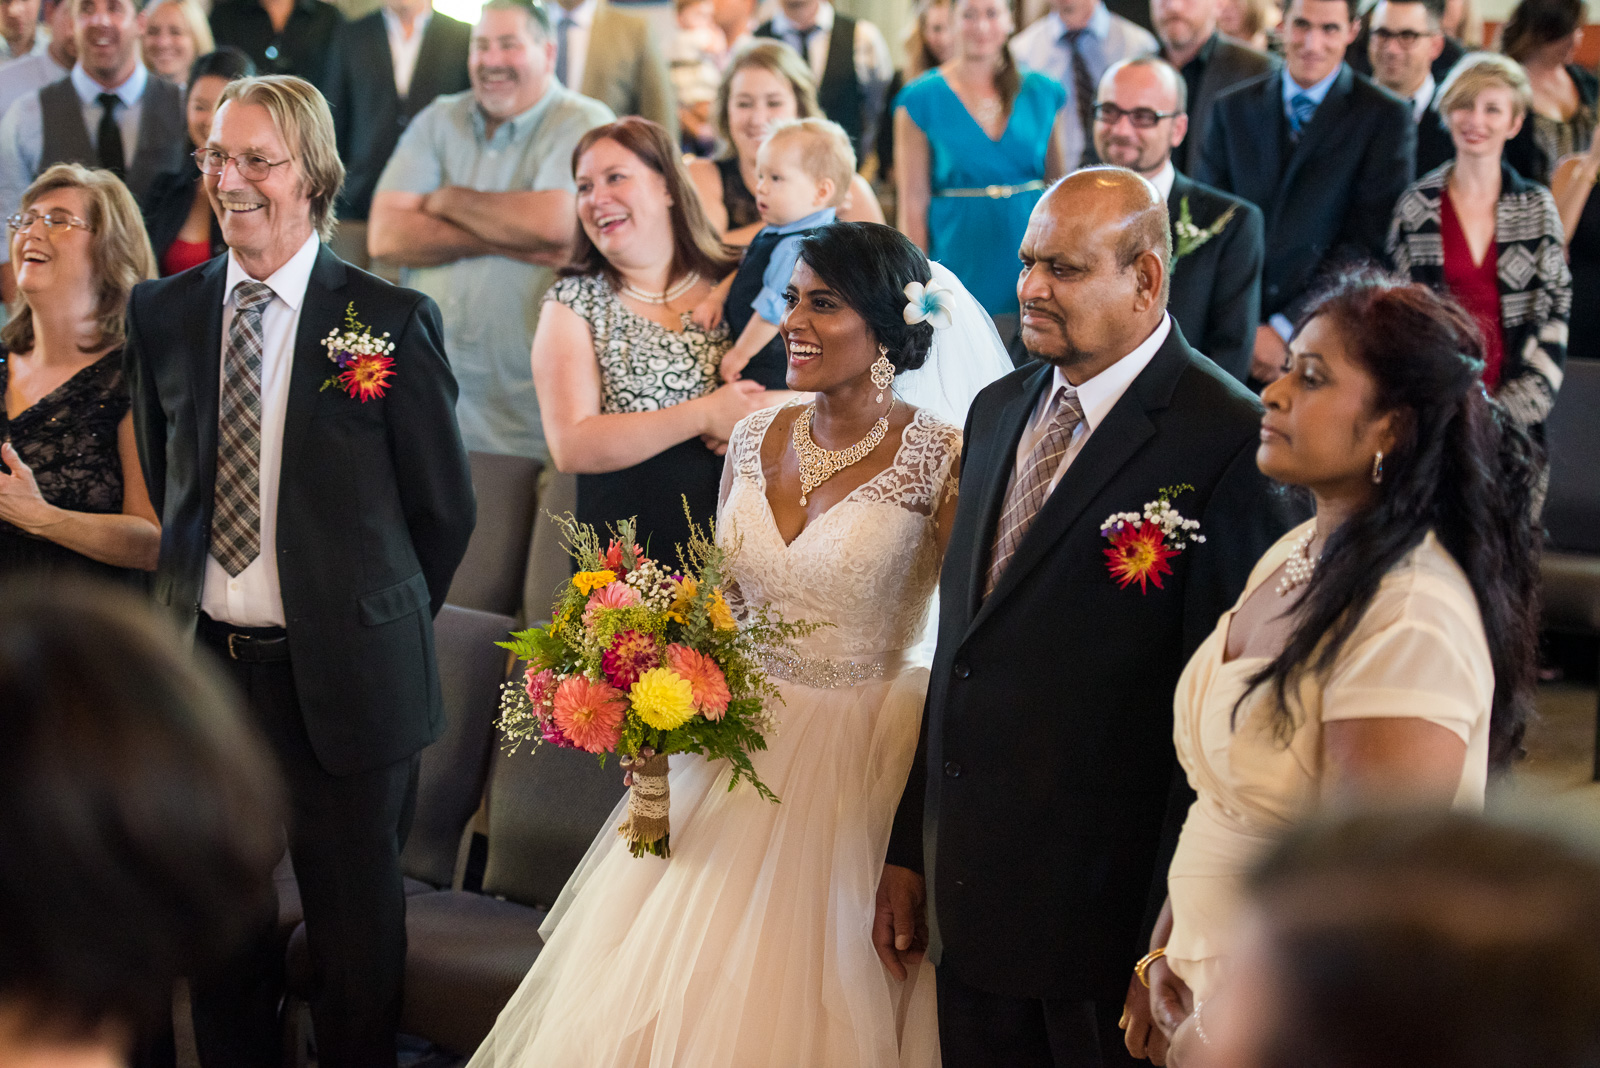 bc-wedding-photographers-paradise-banquet-hall-wedding-14.jpg